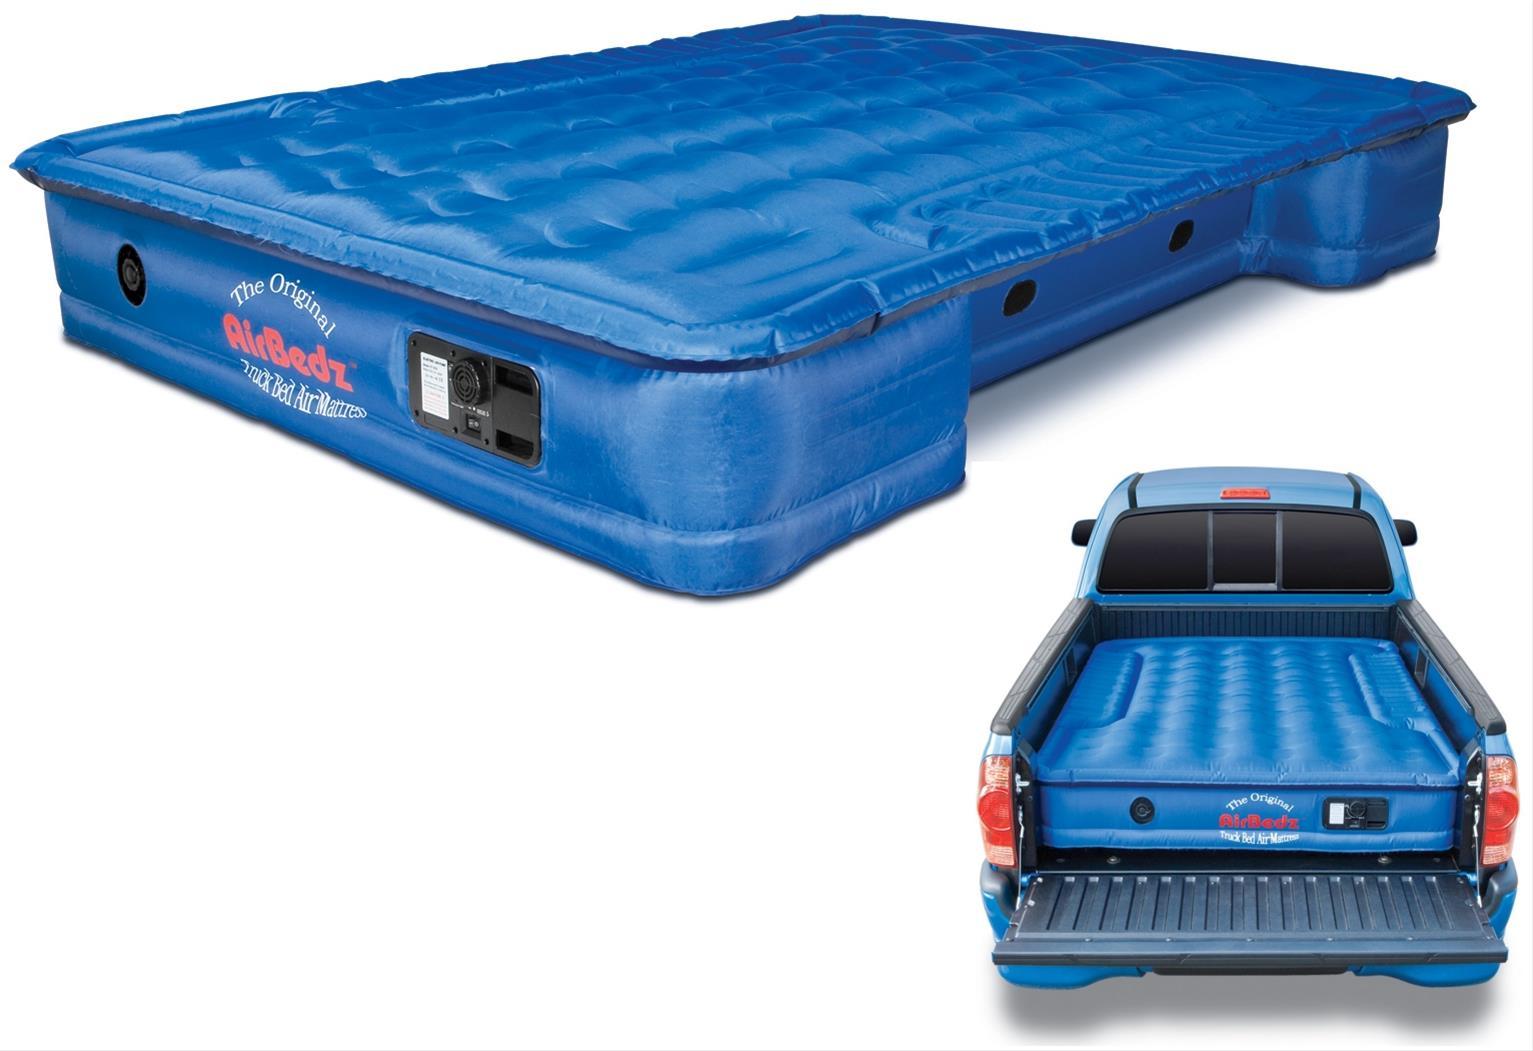 Airbedz Original Truck Bed Air Mattresses Ppi 102 Free